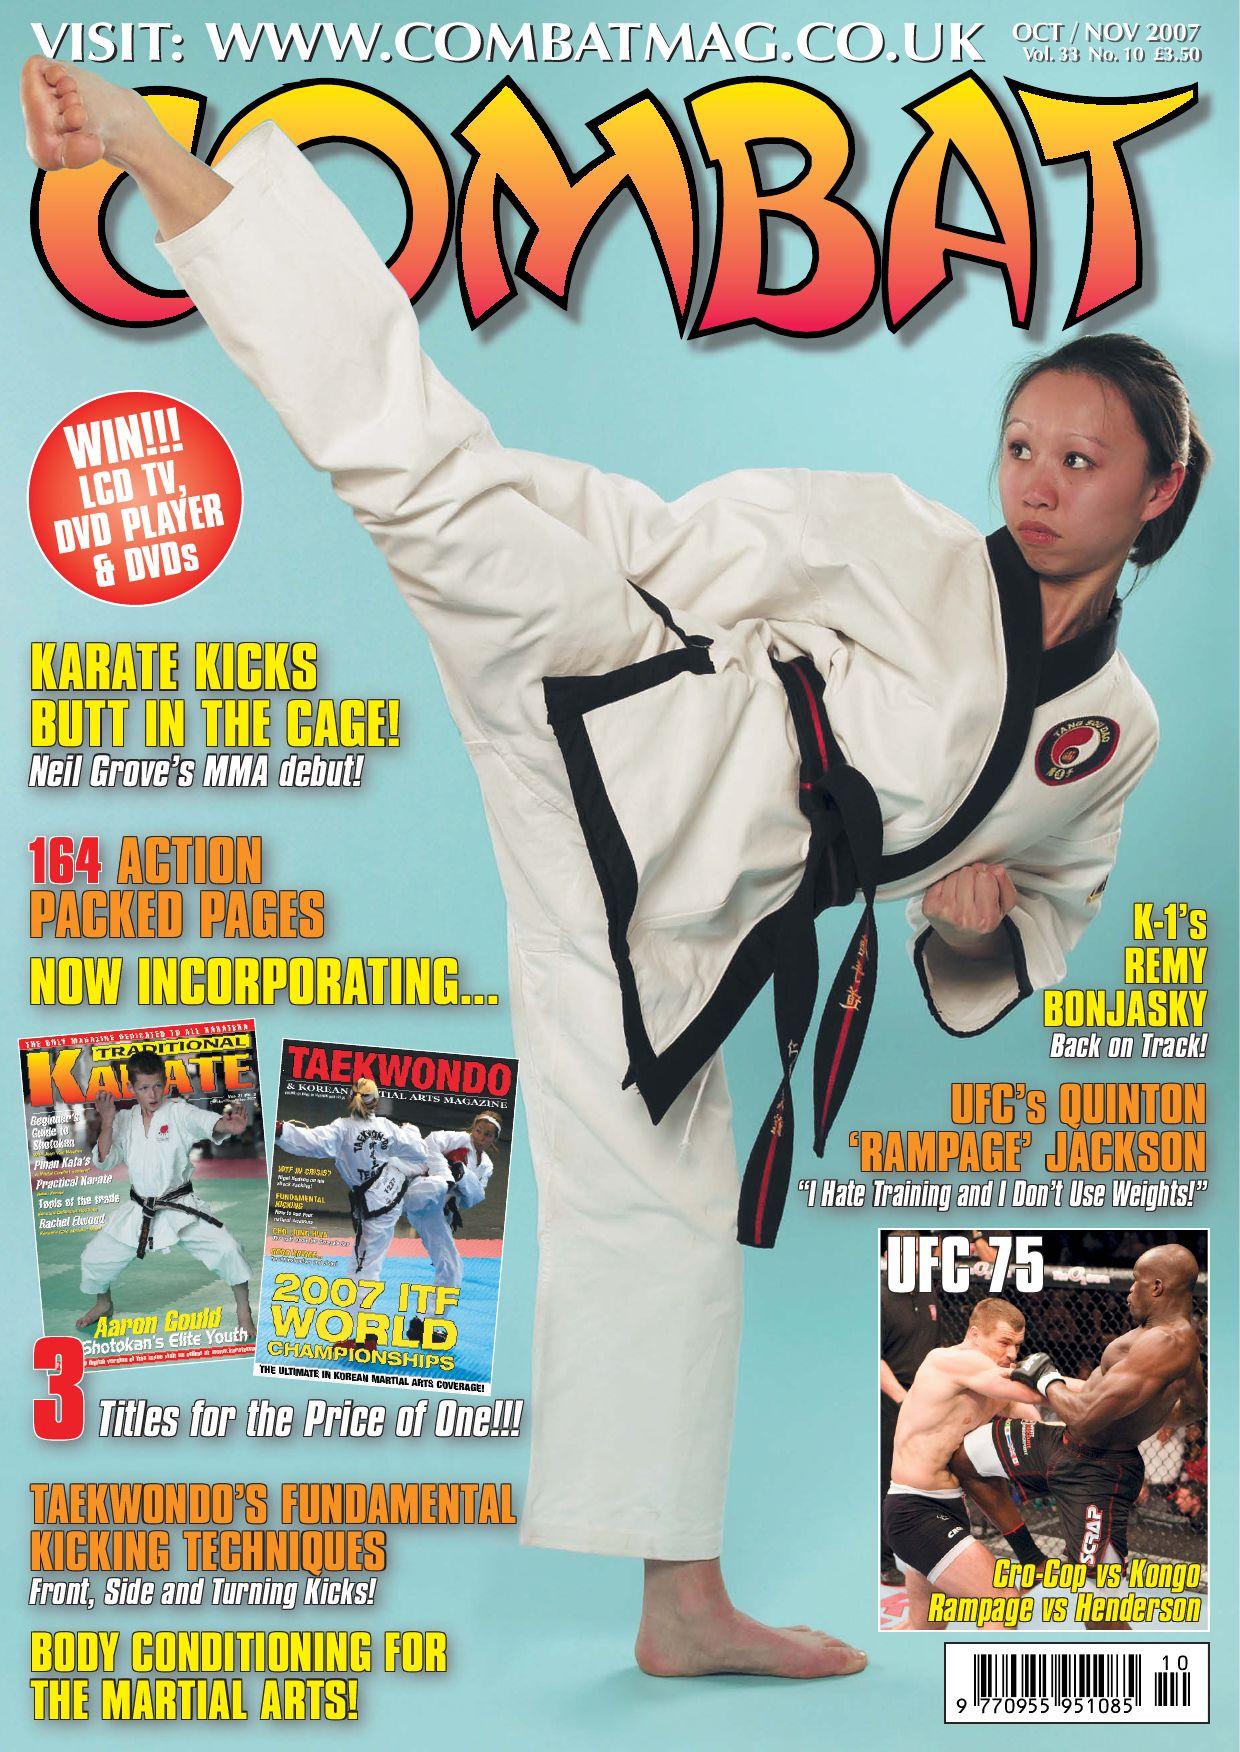 Super Combat Magazine by Martial Arts Publications Ltd - issuu CQ29